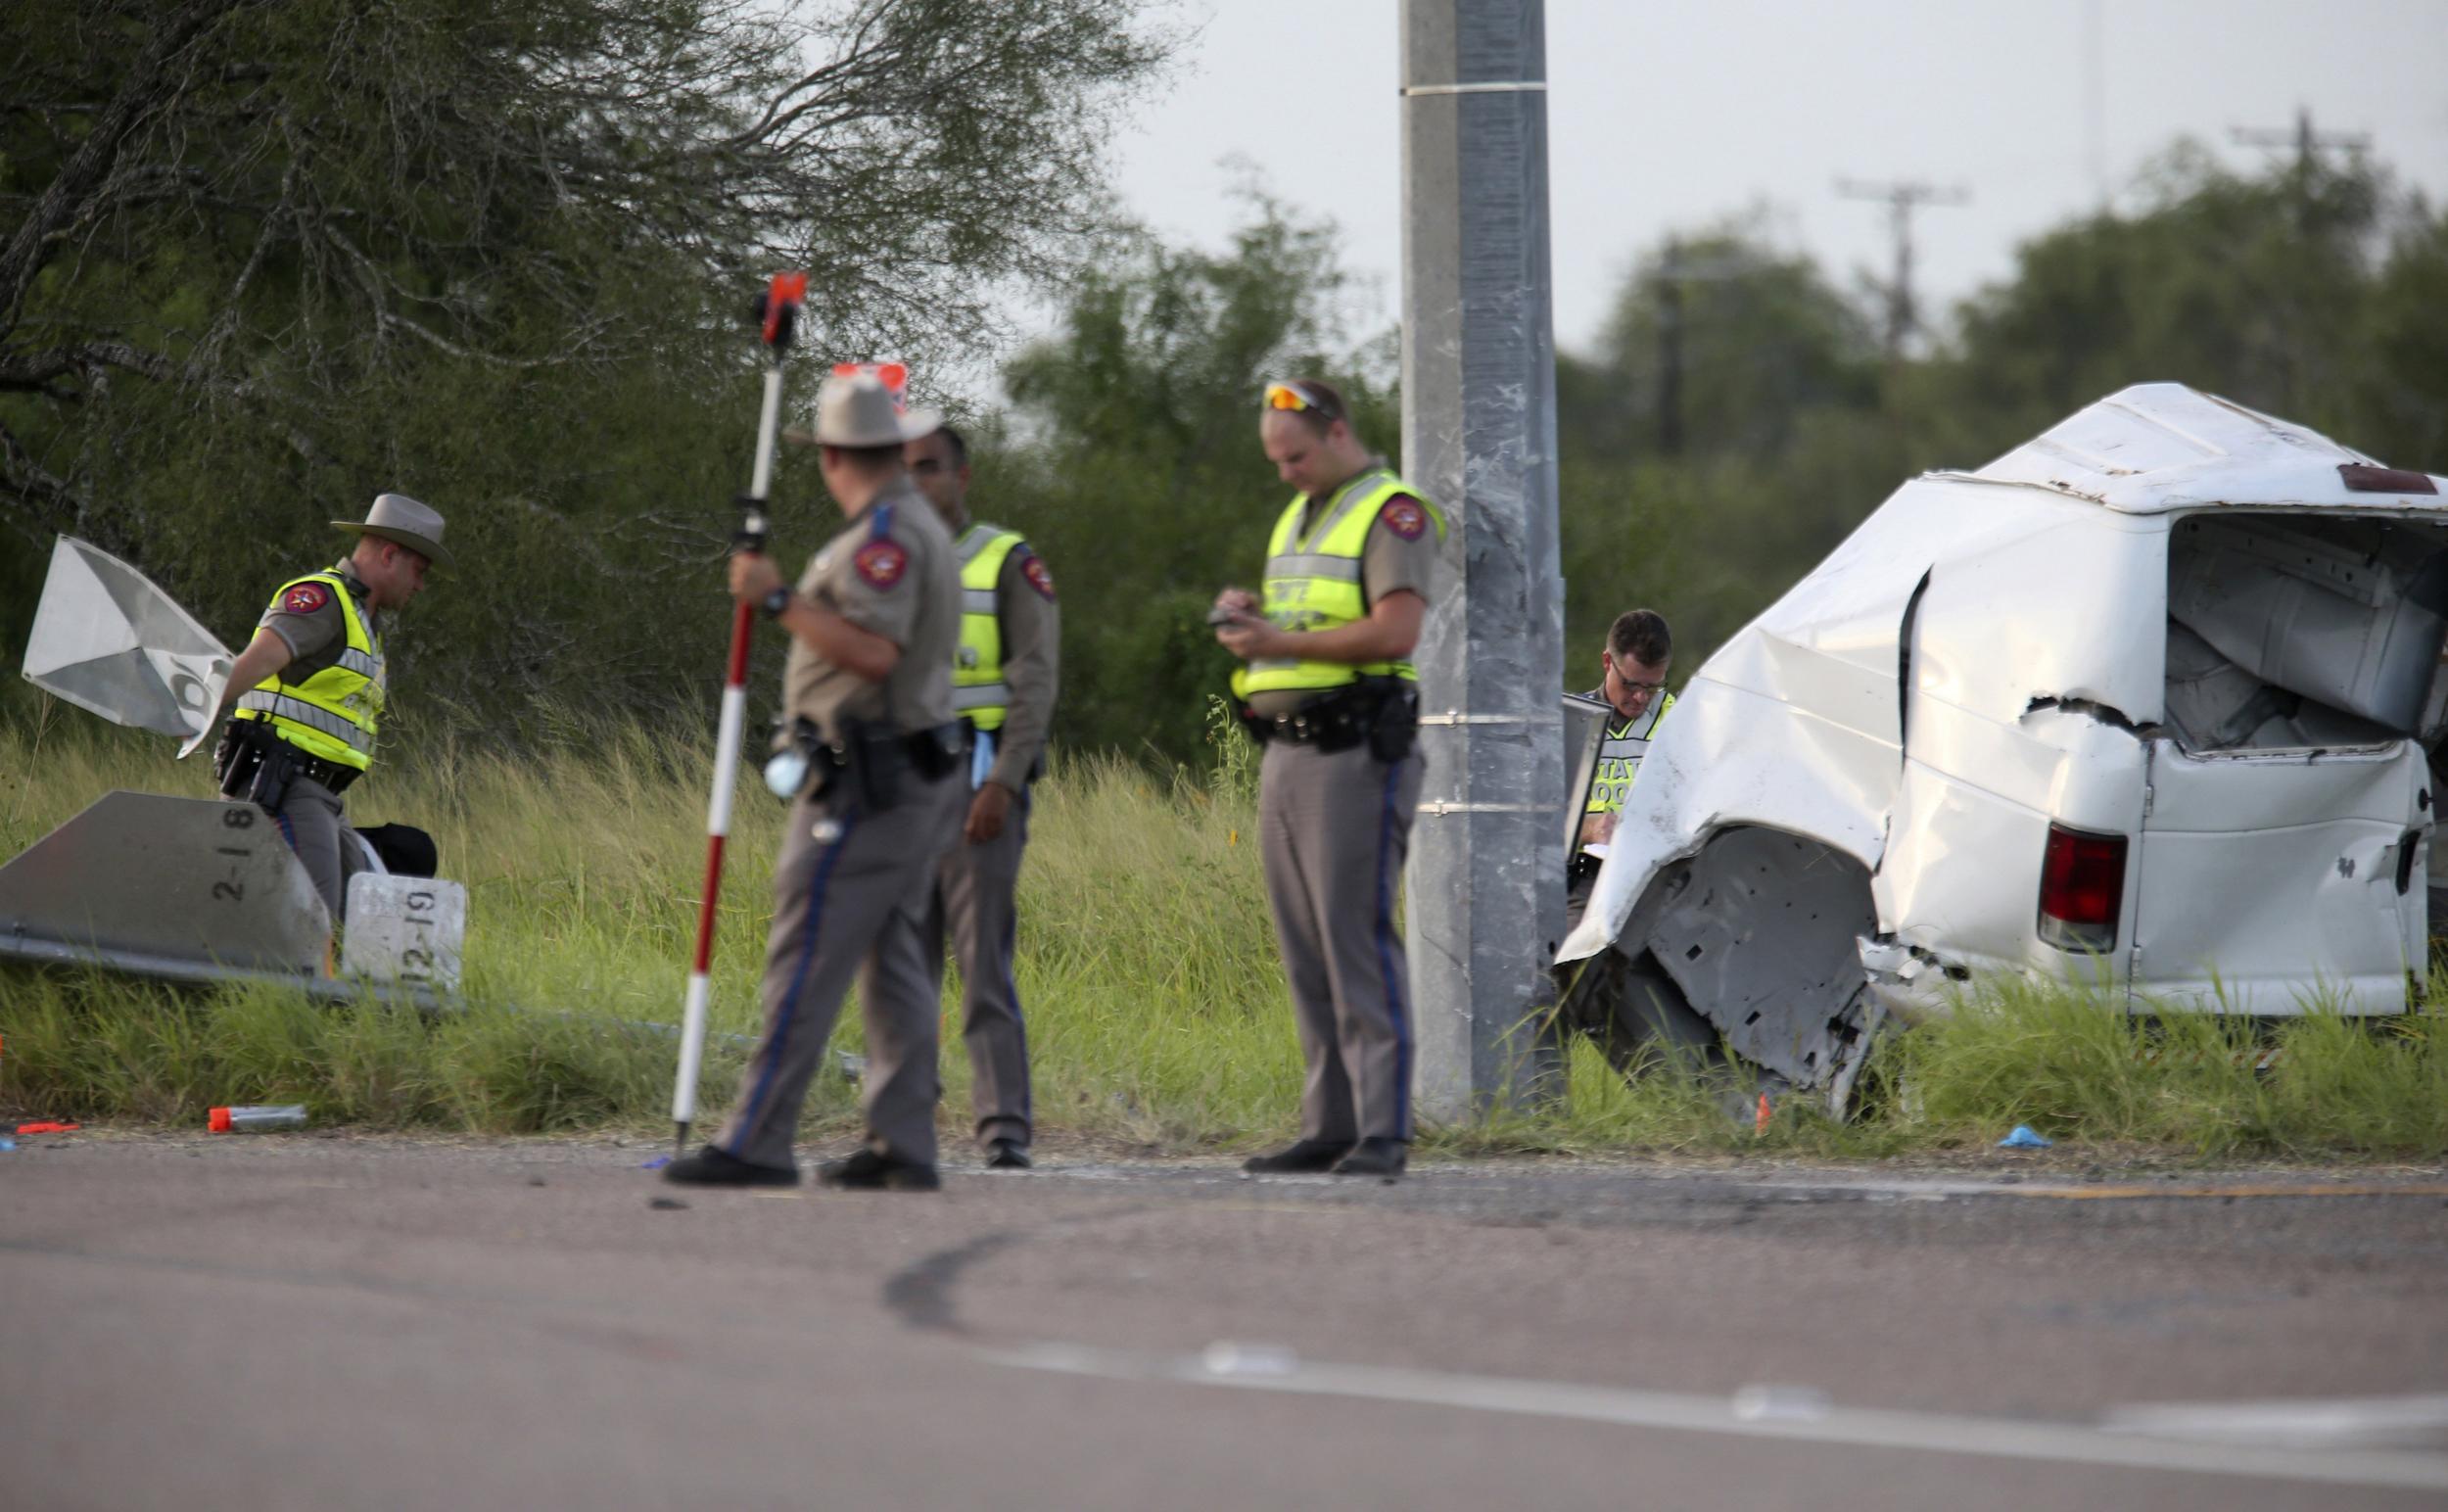 After surviving a deadly van crash, another nightmare awaited him: deportation